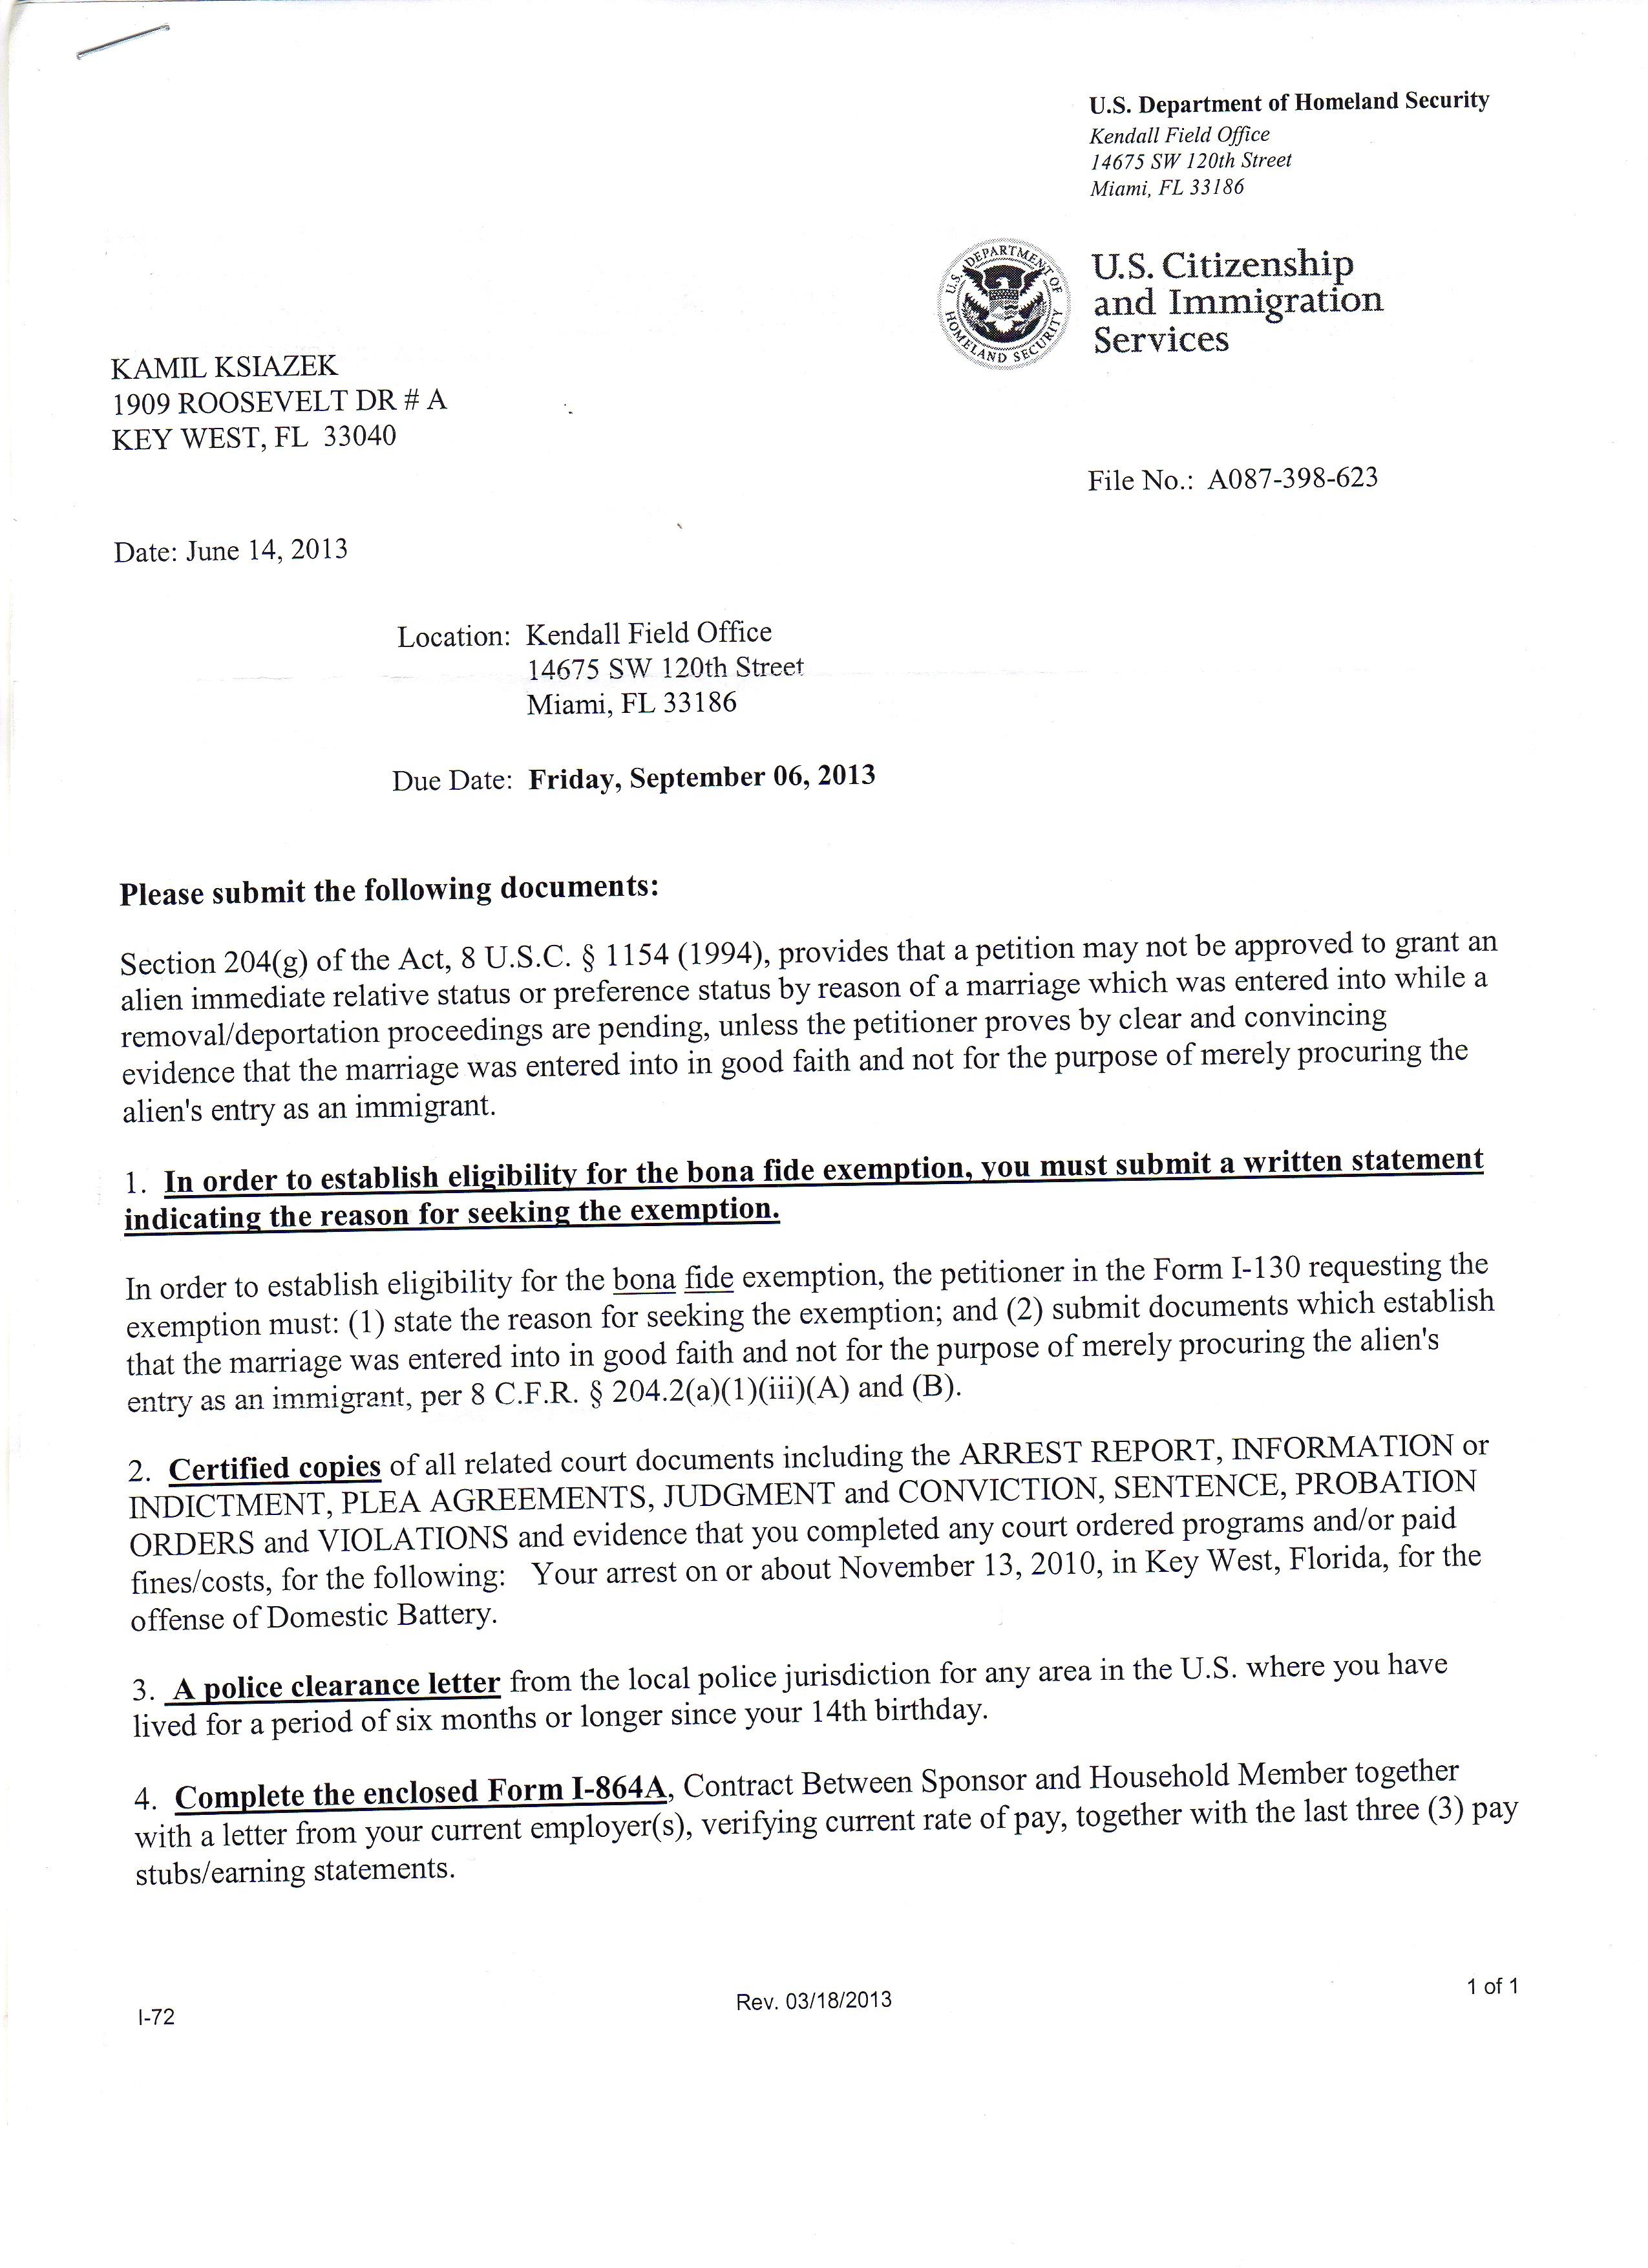 Affidavit Format For Marriage Declaration